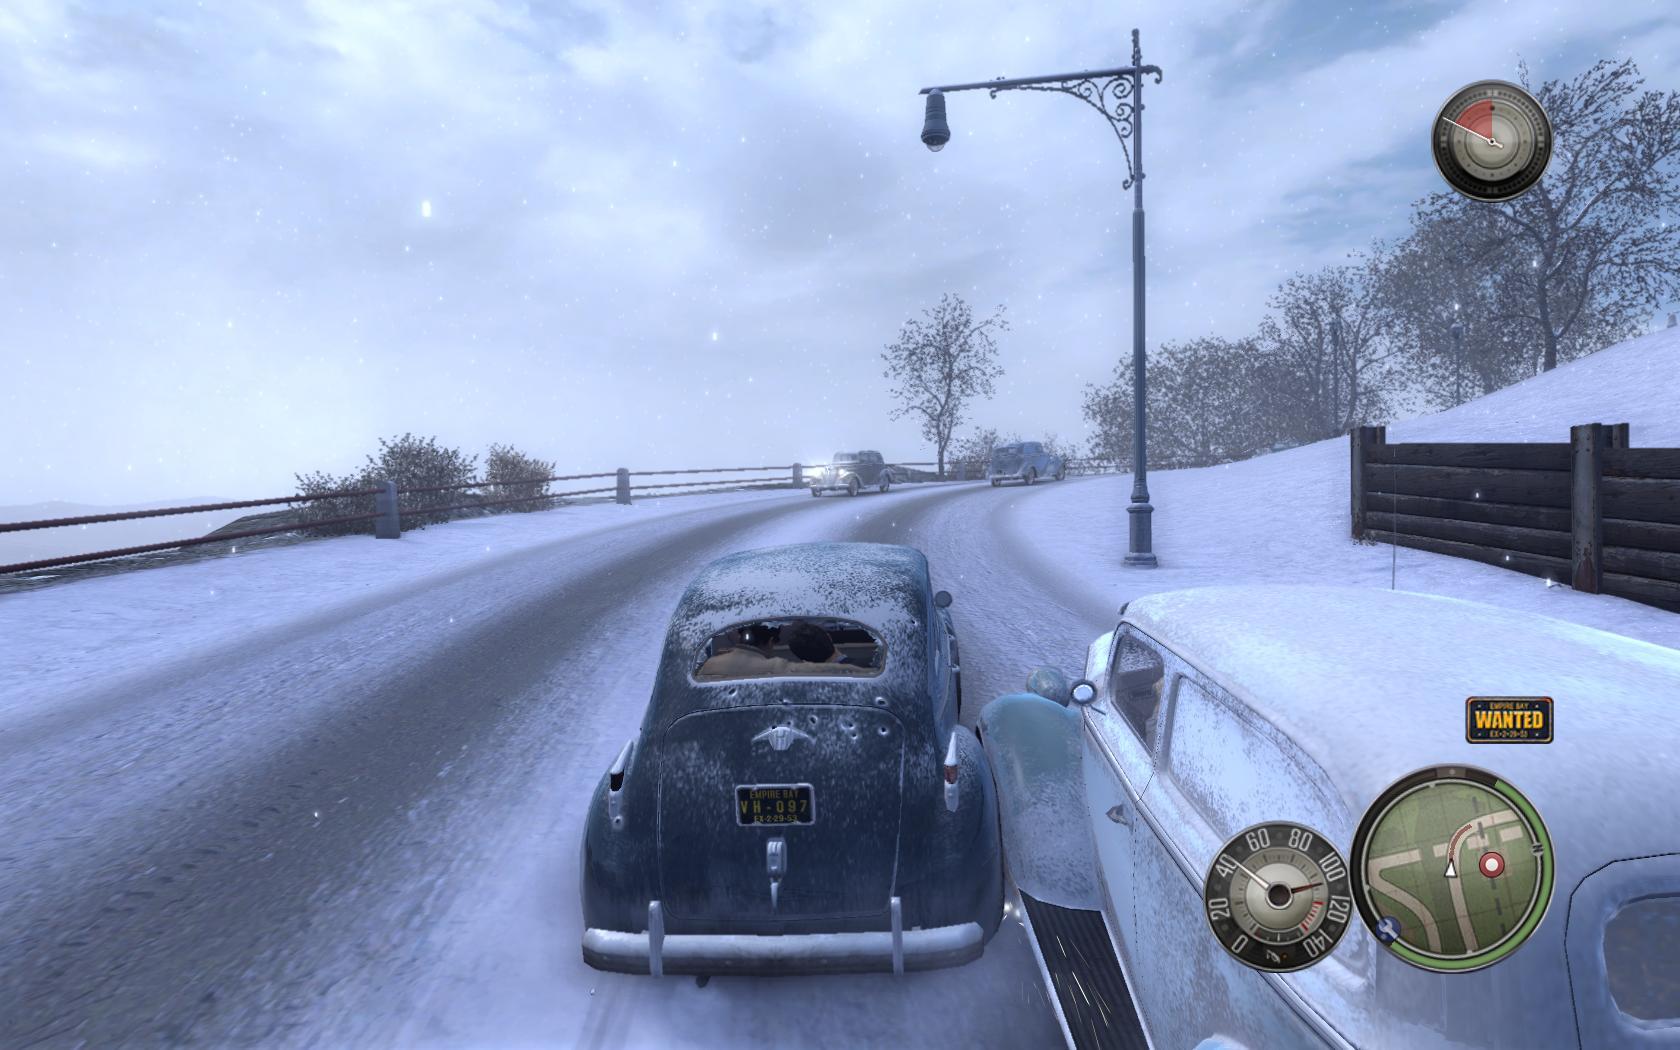 Mafia_2_car'n'snow - Mafia 2